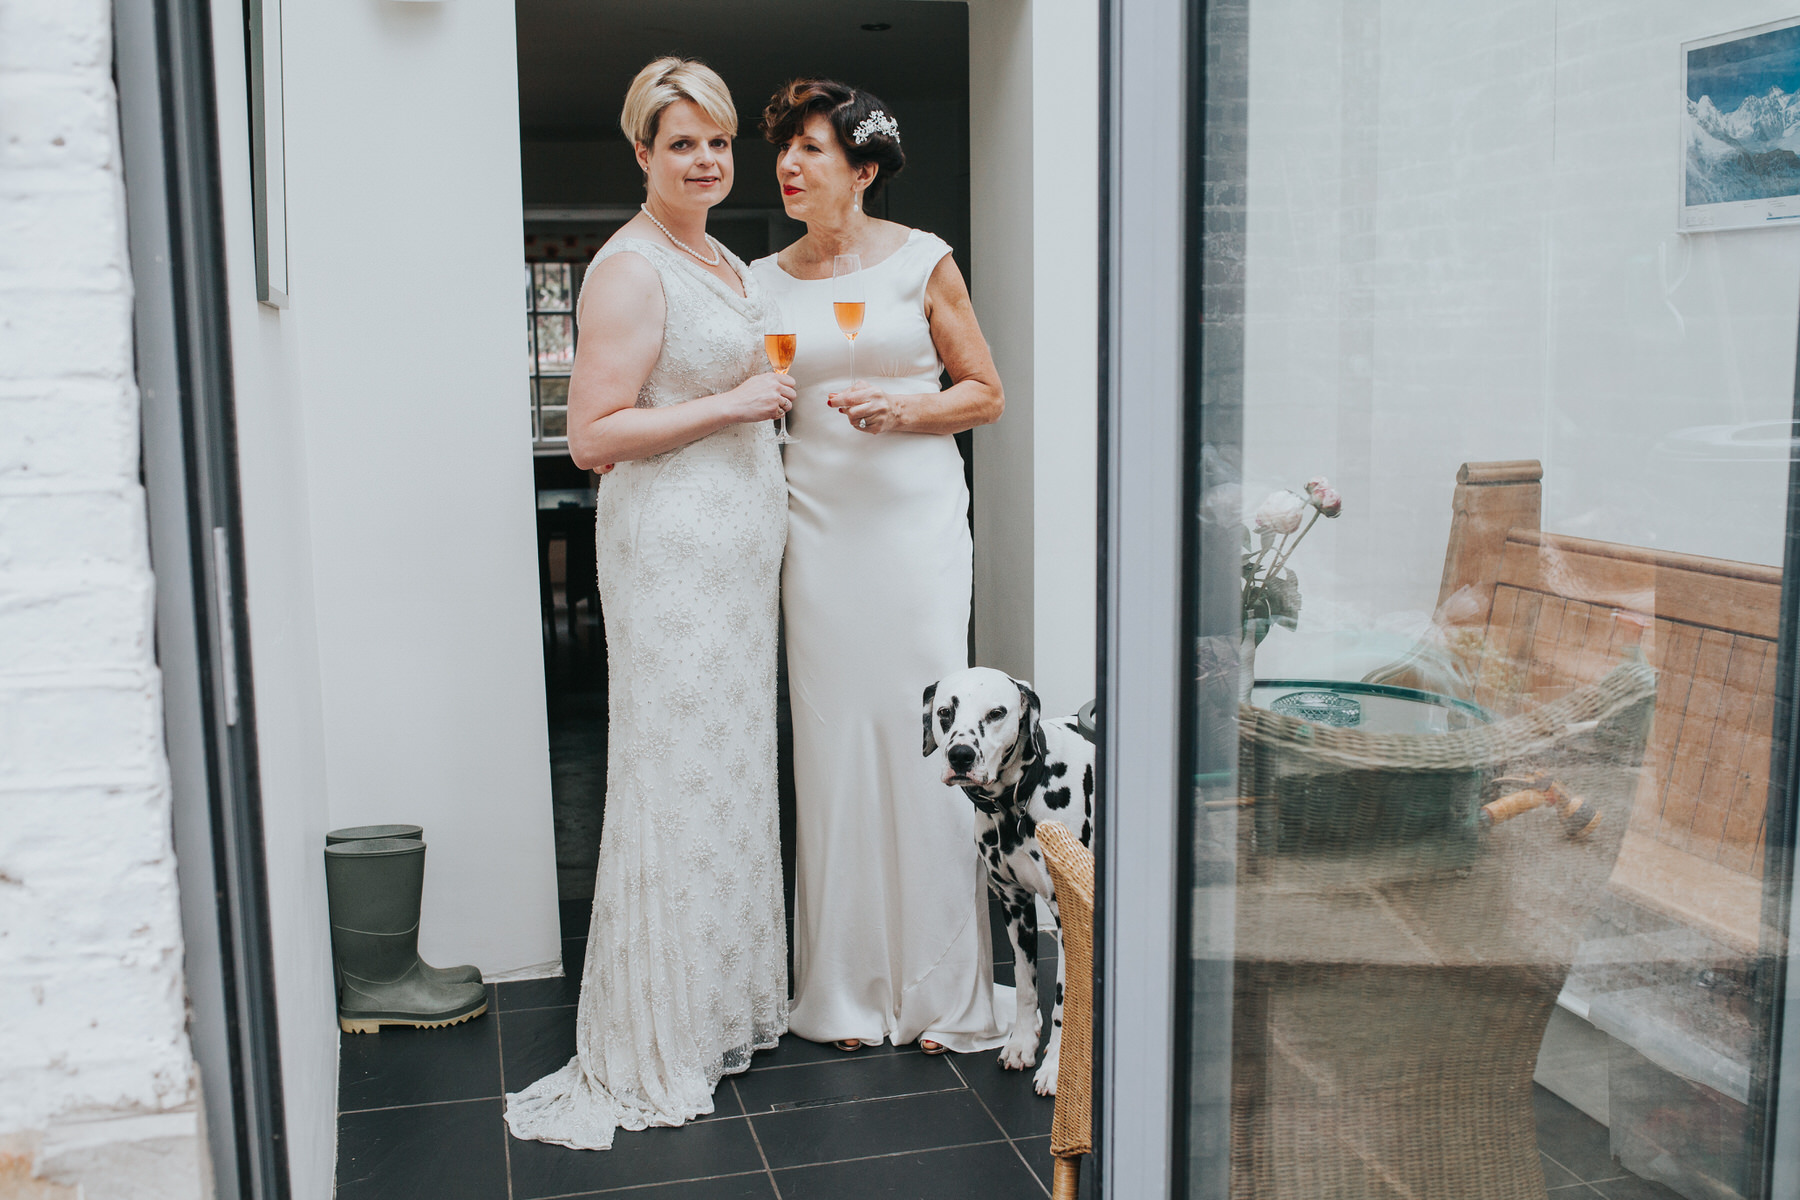 52 Islington two brides toast pink champagne dalmatian dog.jpg